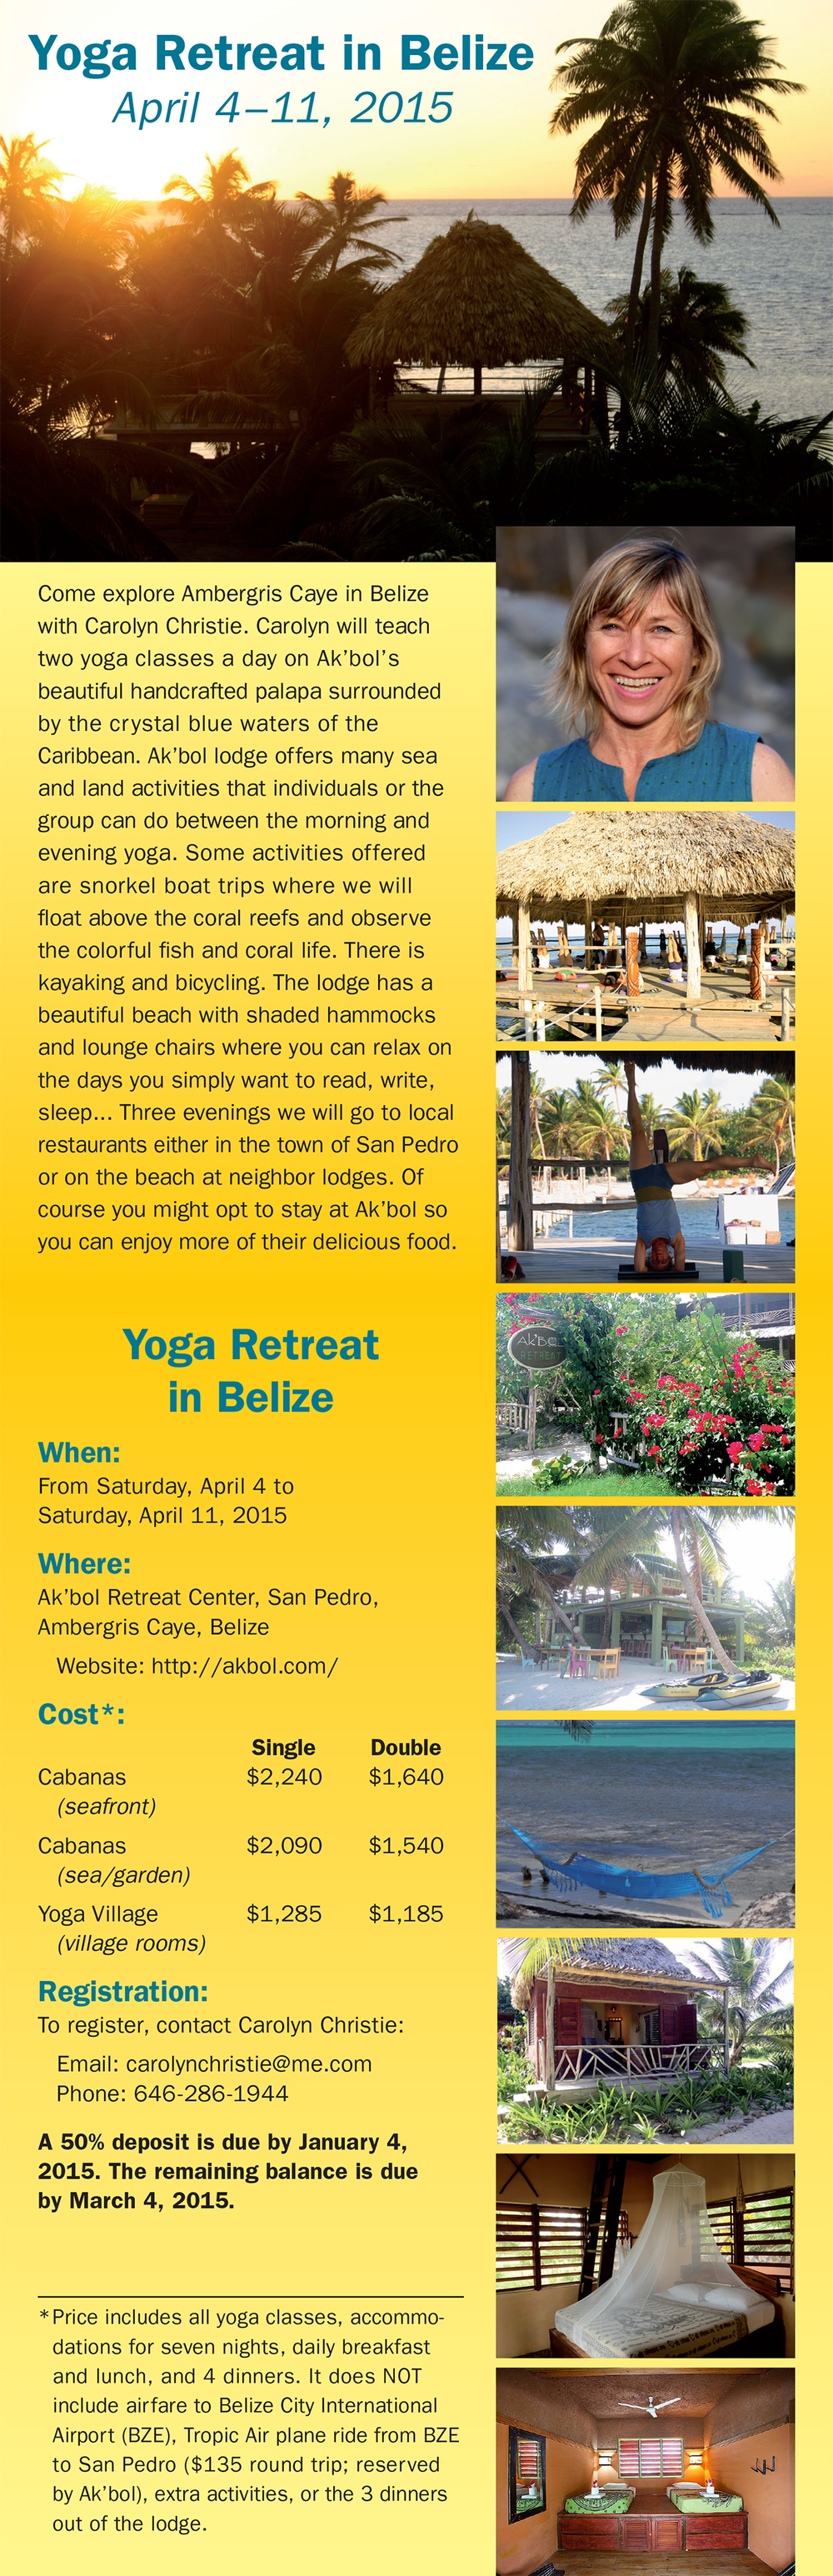 Carolyn Christie on last year's Belize trip